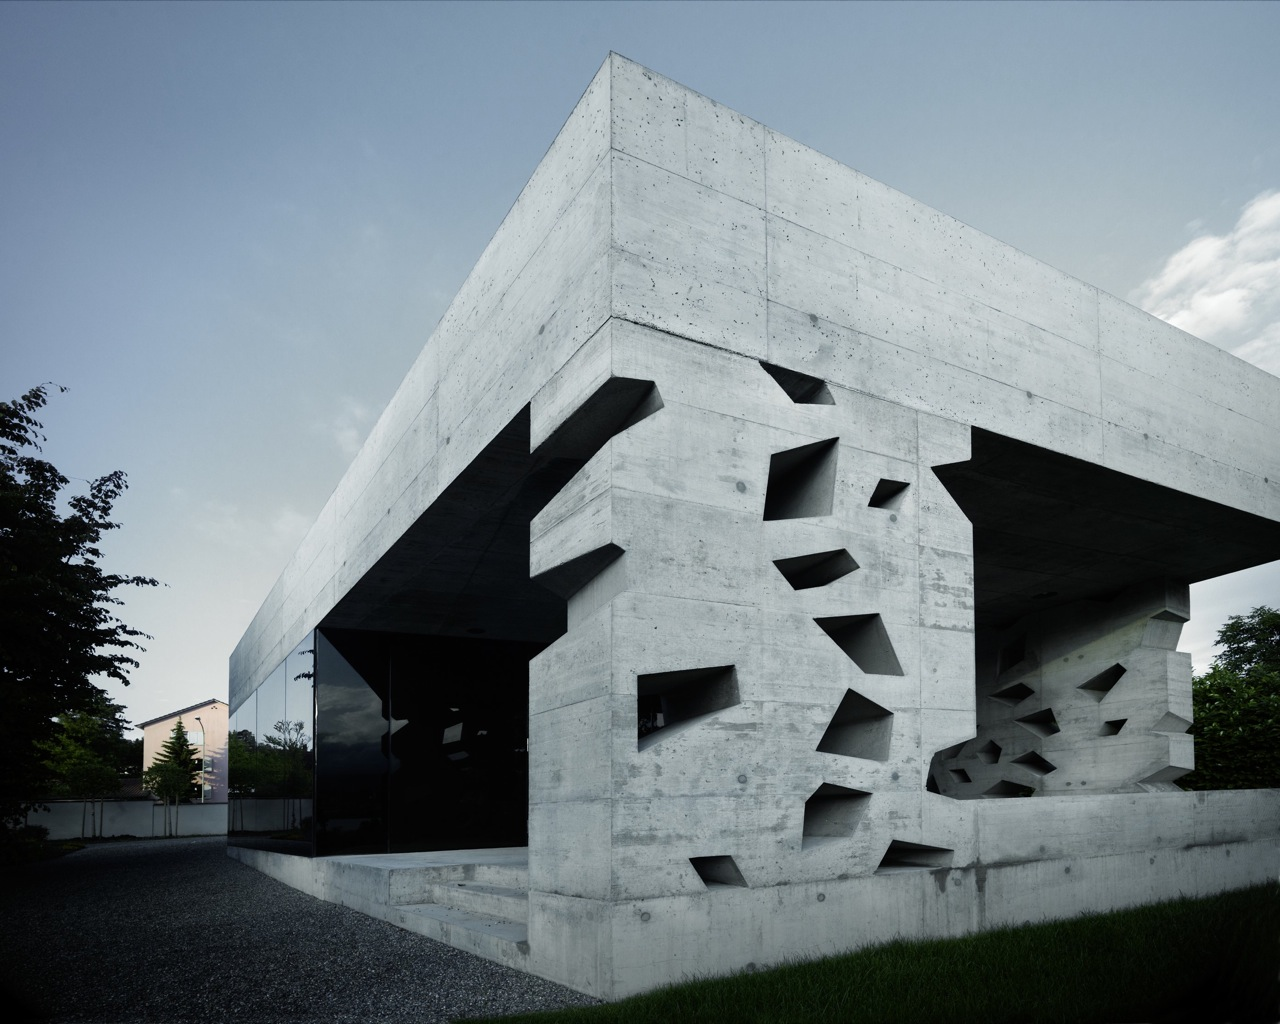 Erlenbach Cemetery Building / AFGH, © Valentin Jeck